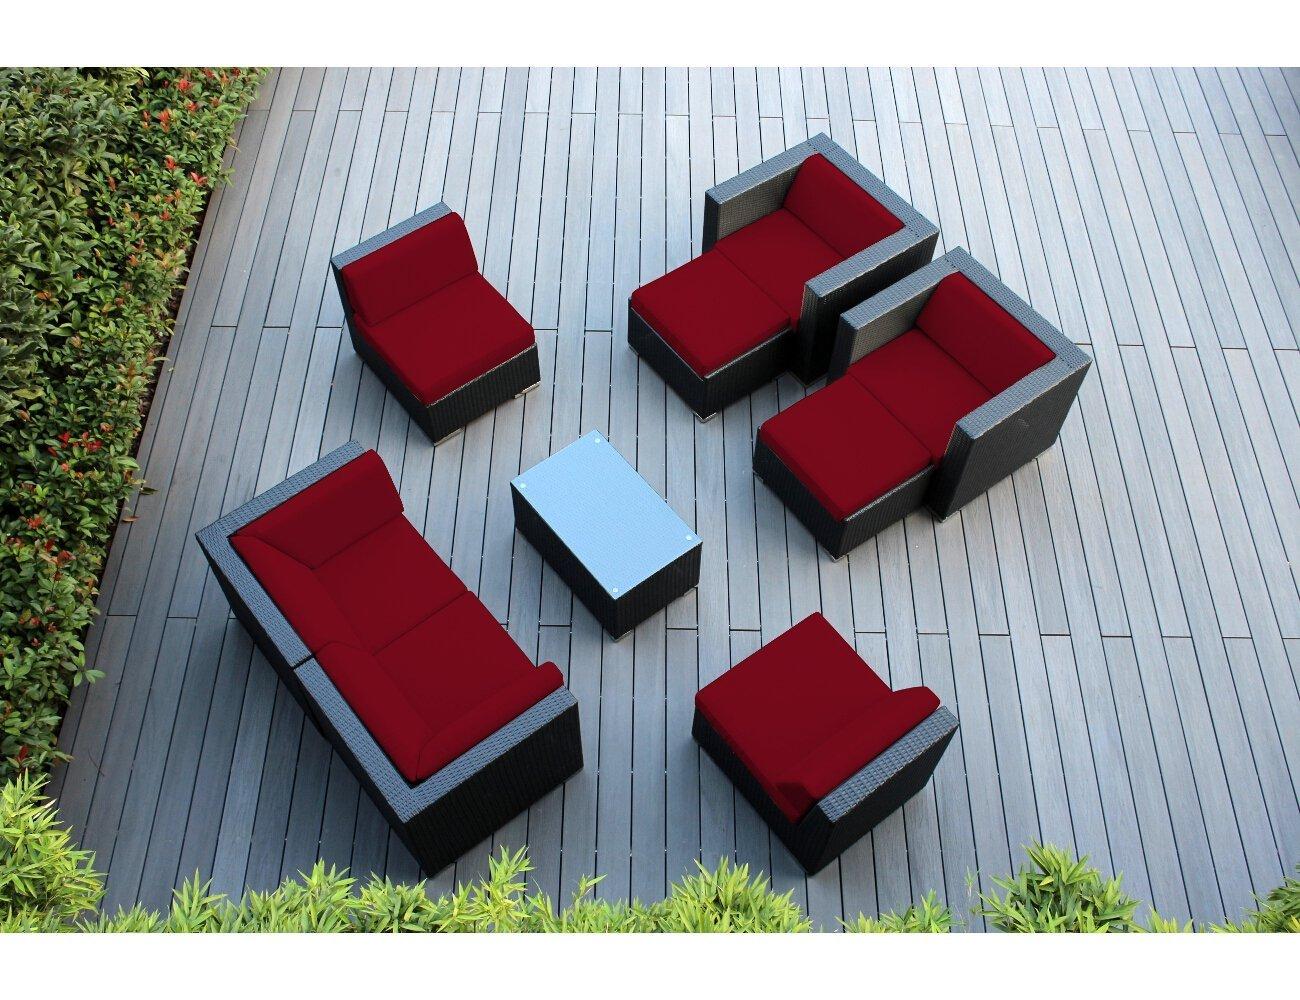 Outdoor Wicker Patio Furniture genuine ohana 9-piece outdoor wicker patio furniture sectional